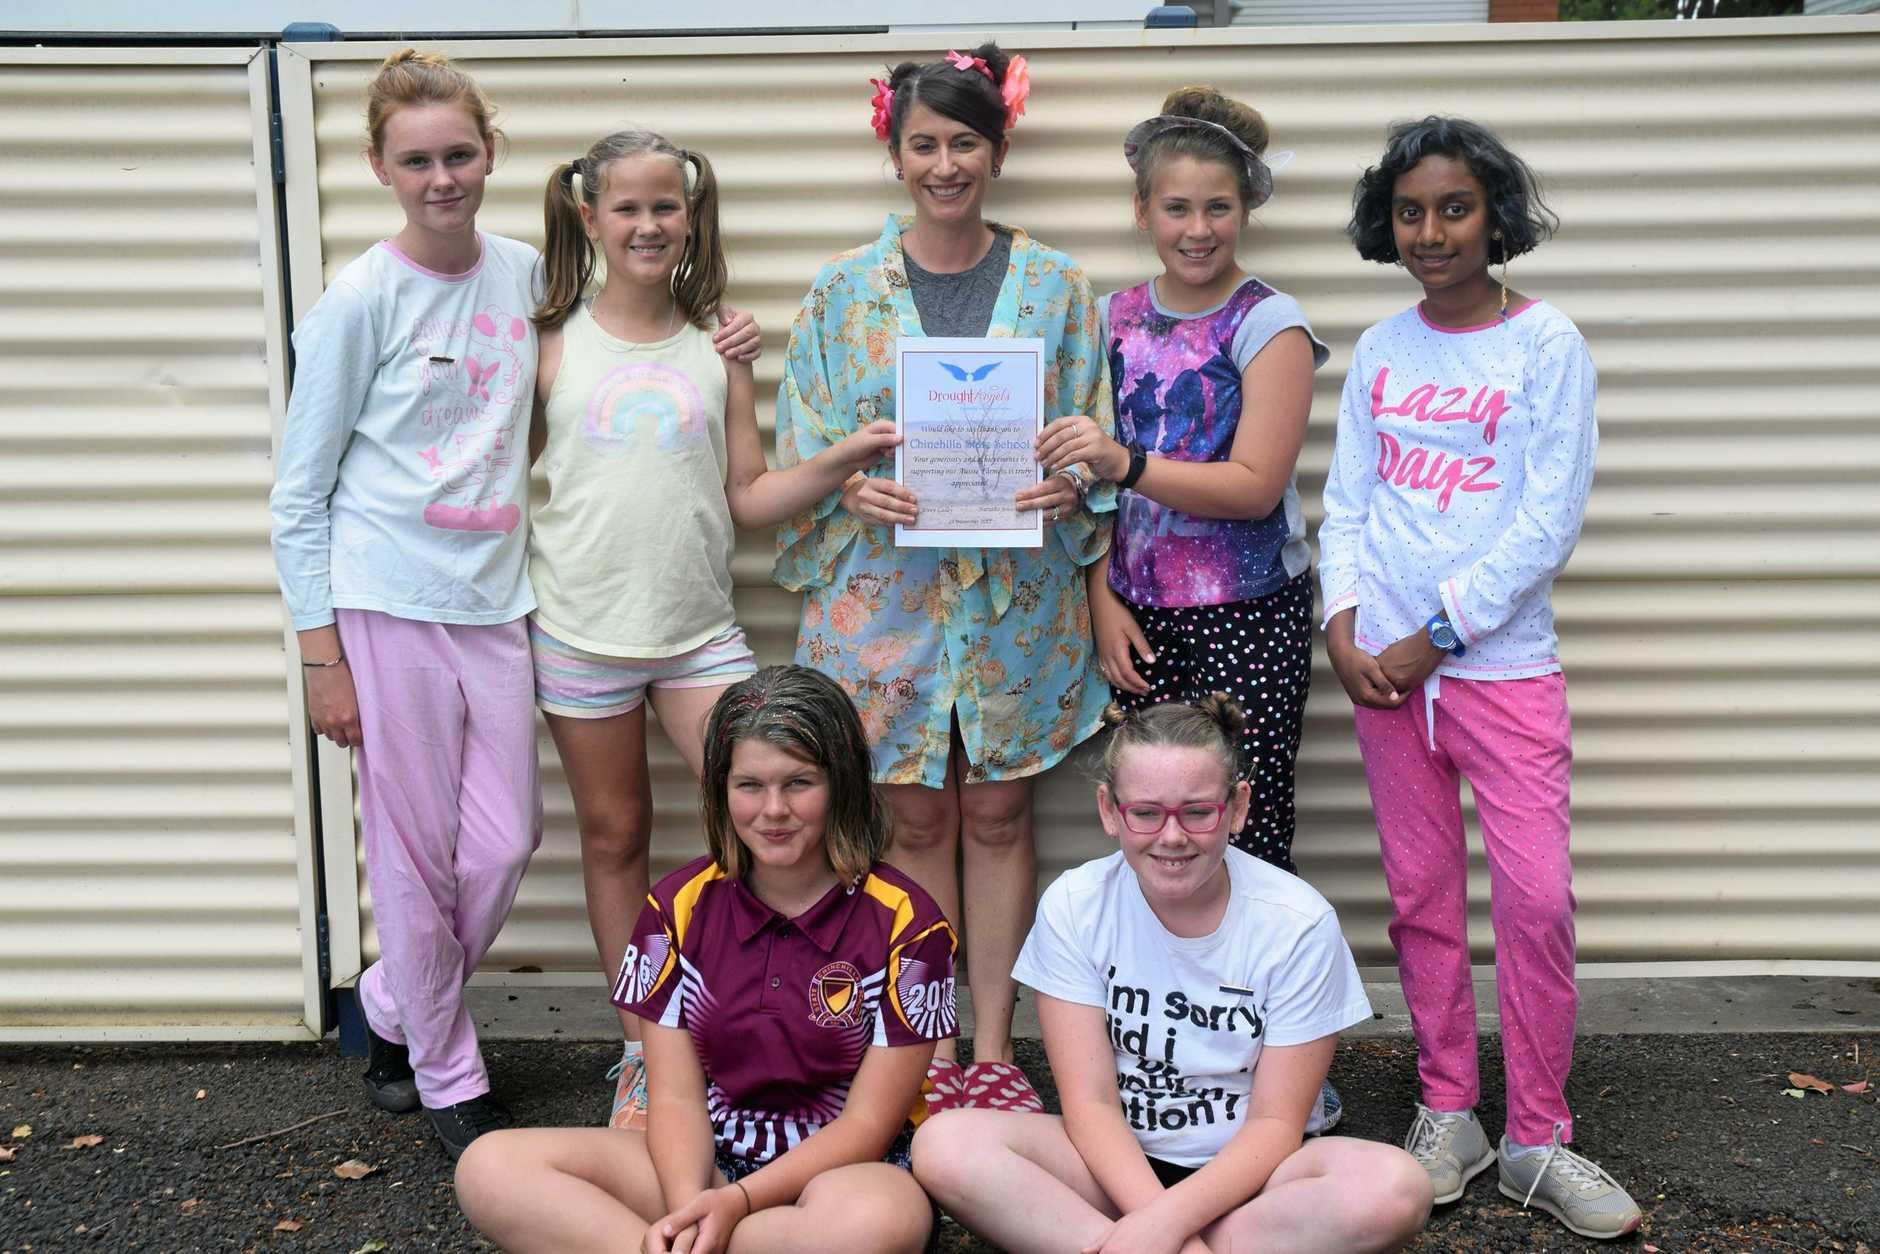 Amy Easterbrook, Josephine Truntle, Celeste Lee, Tori Wilce, Rashmi Chandran, Frances Mills, Libby Zhacek  Shave for a cure Chinchilla State School Nov 2017